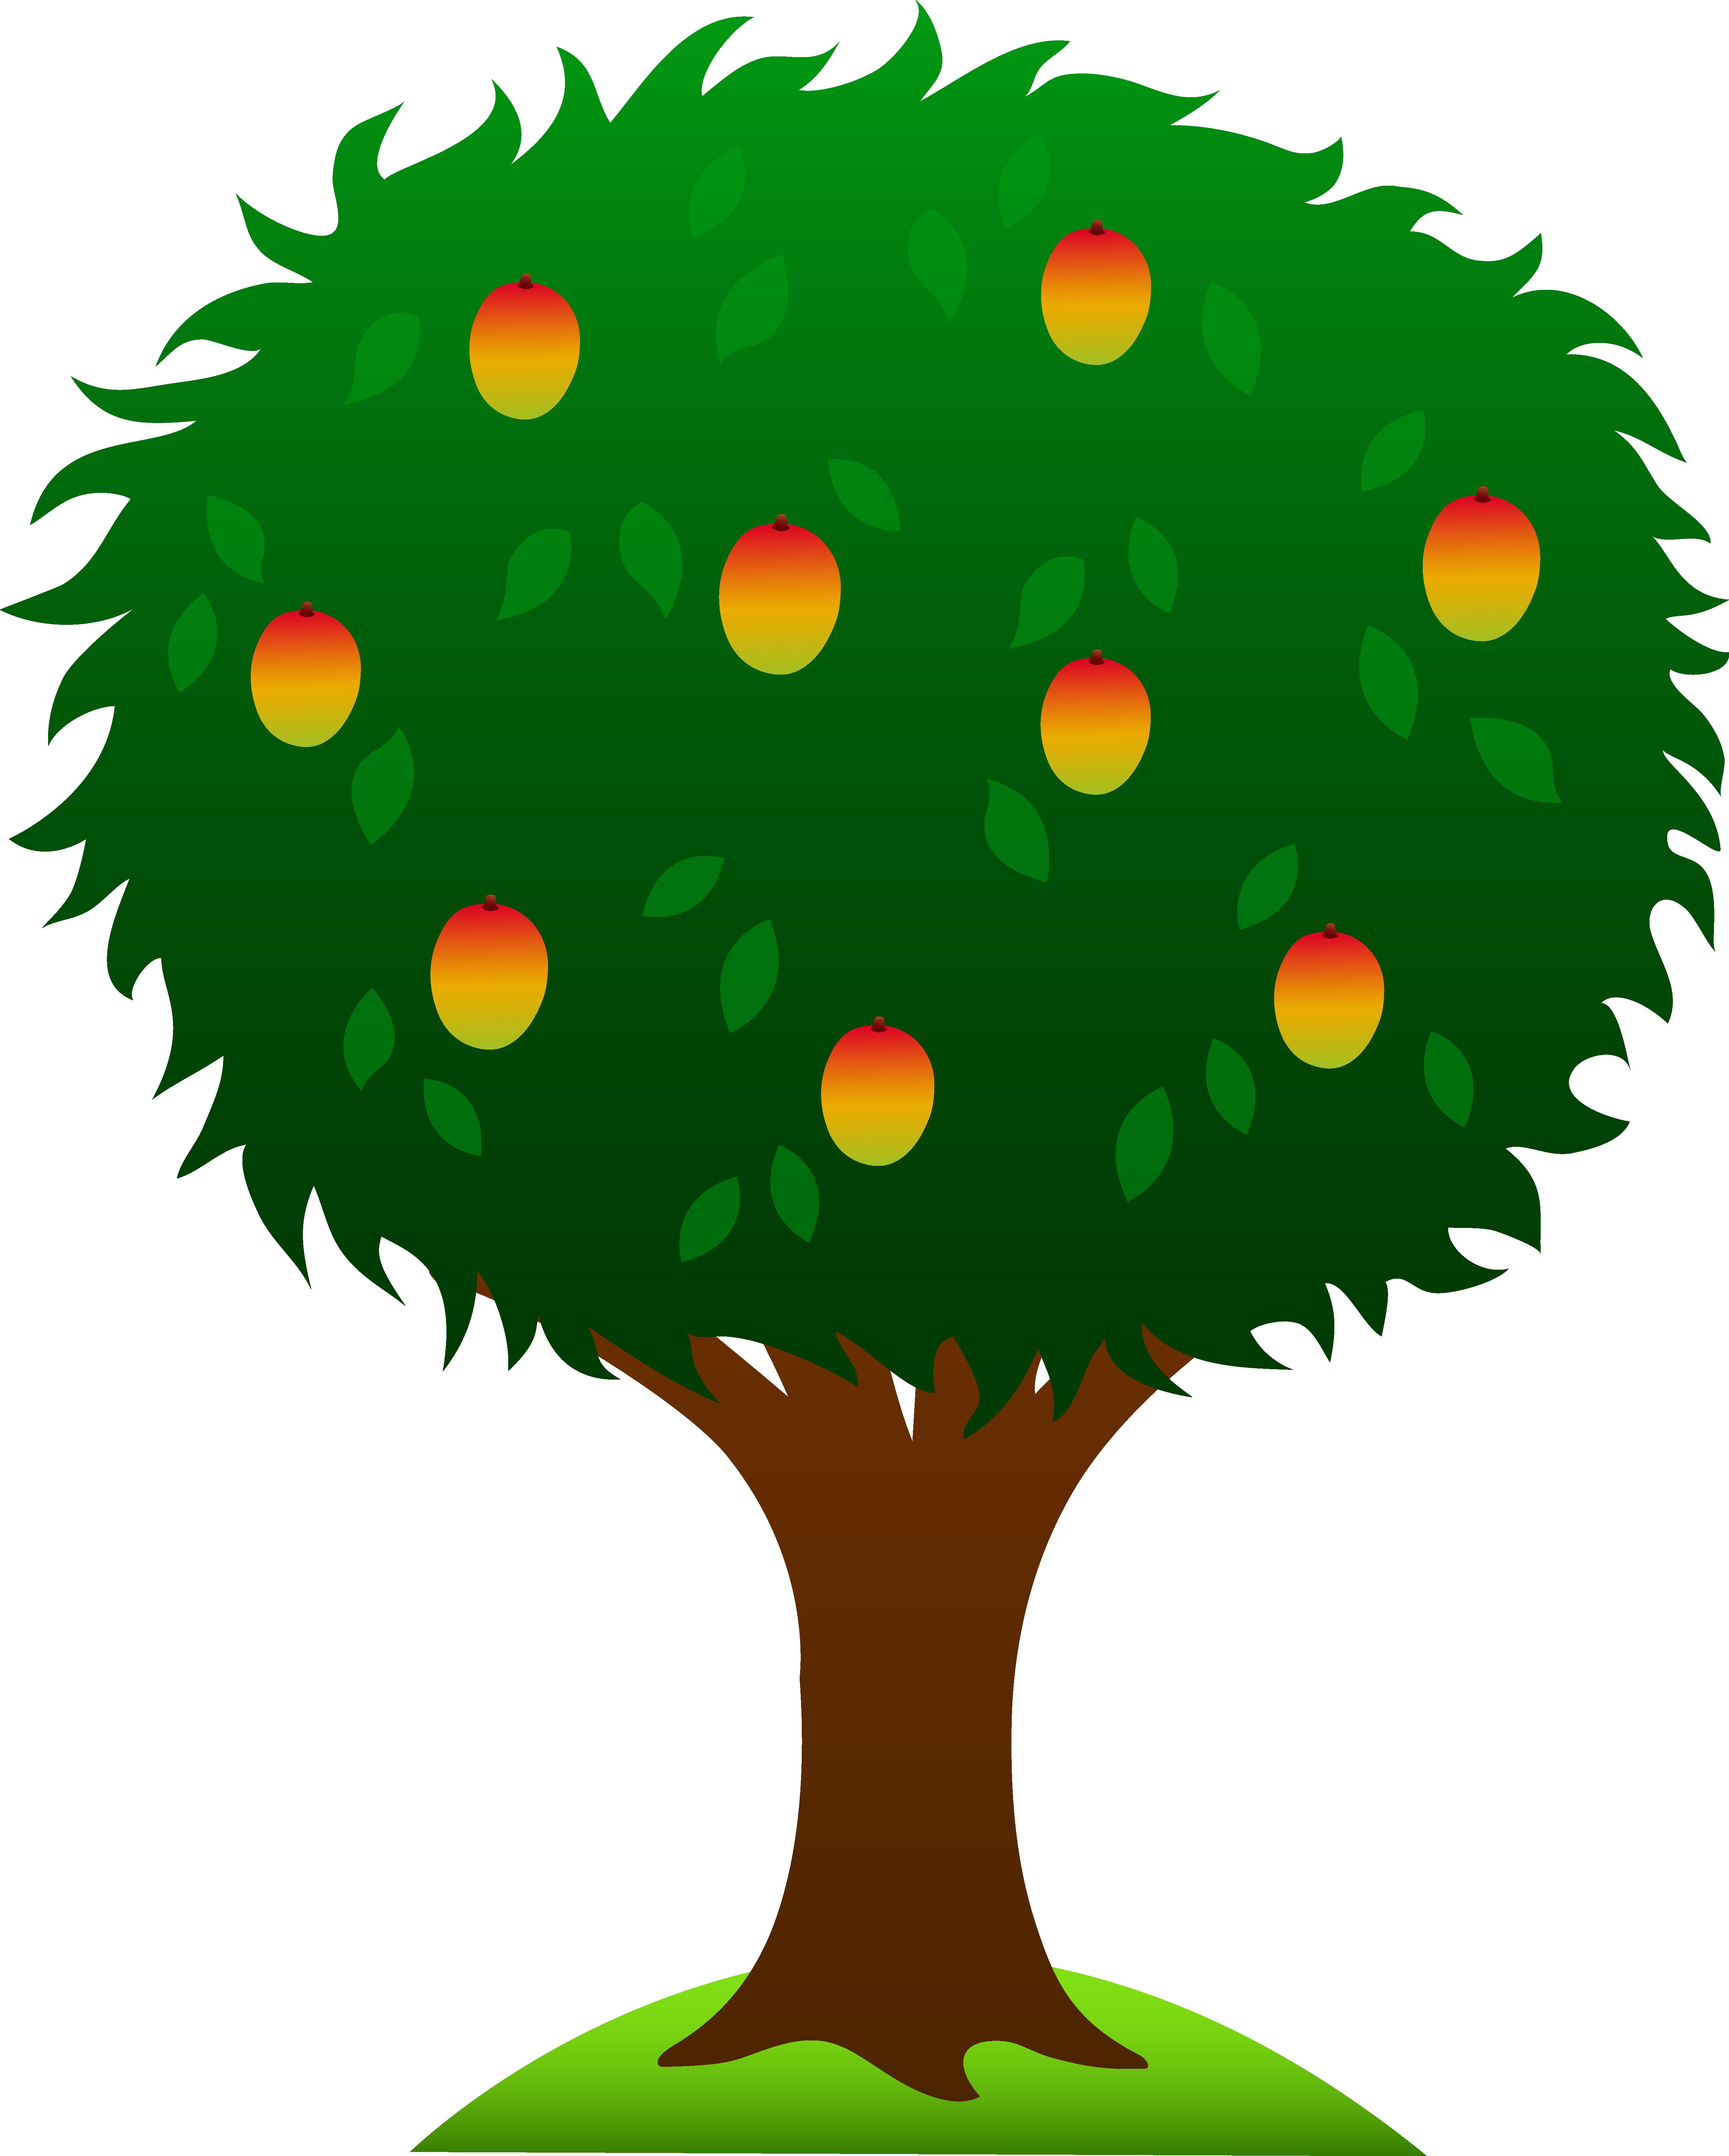 Peach Tree Clip Art - ClipArt Best